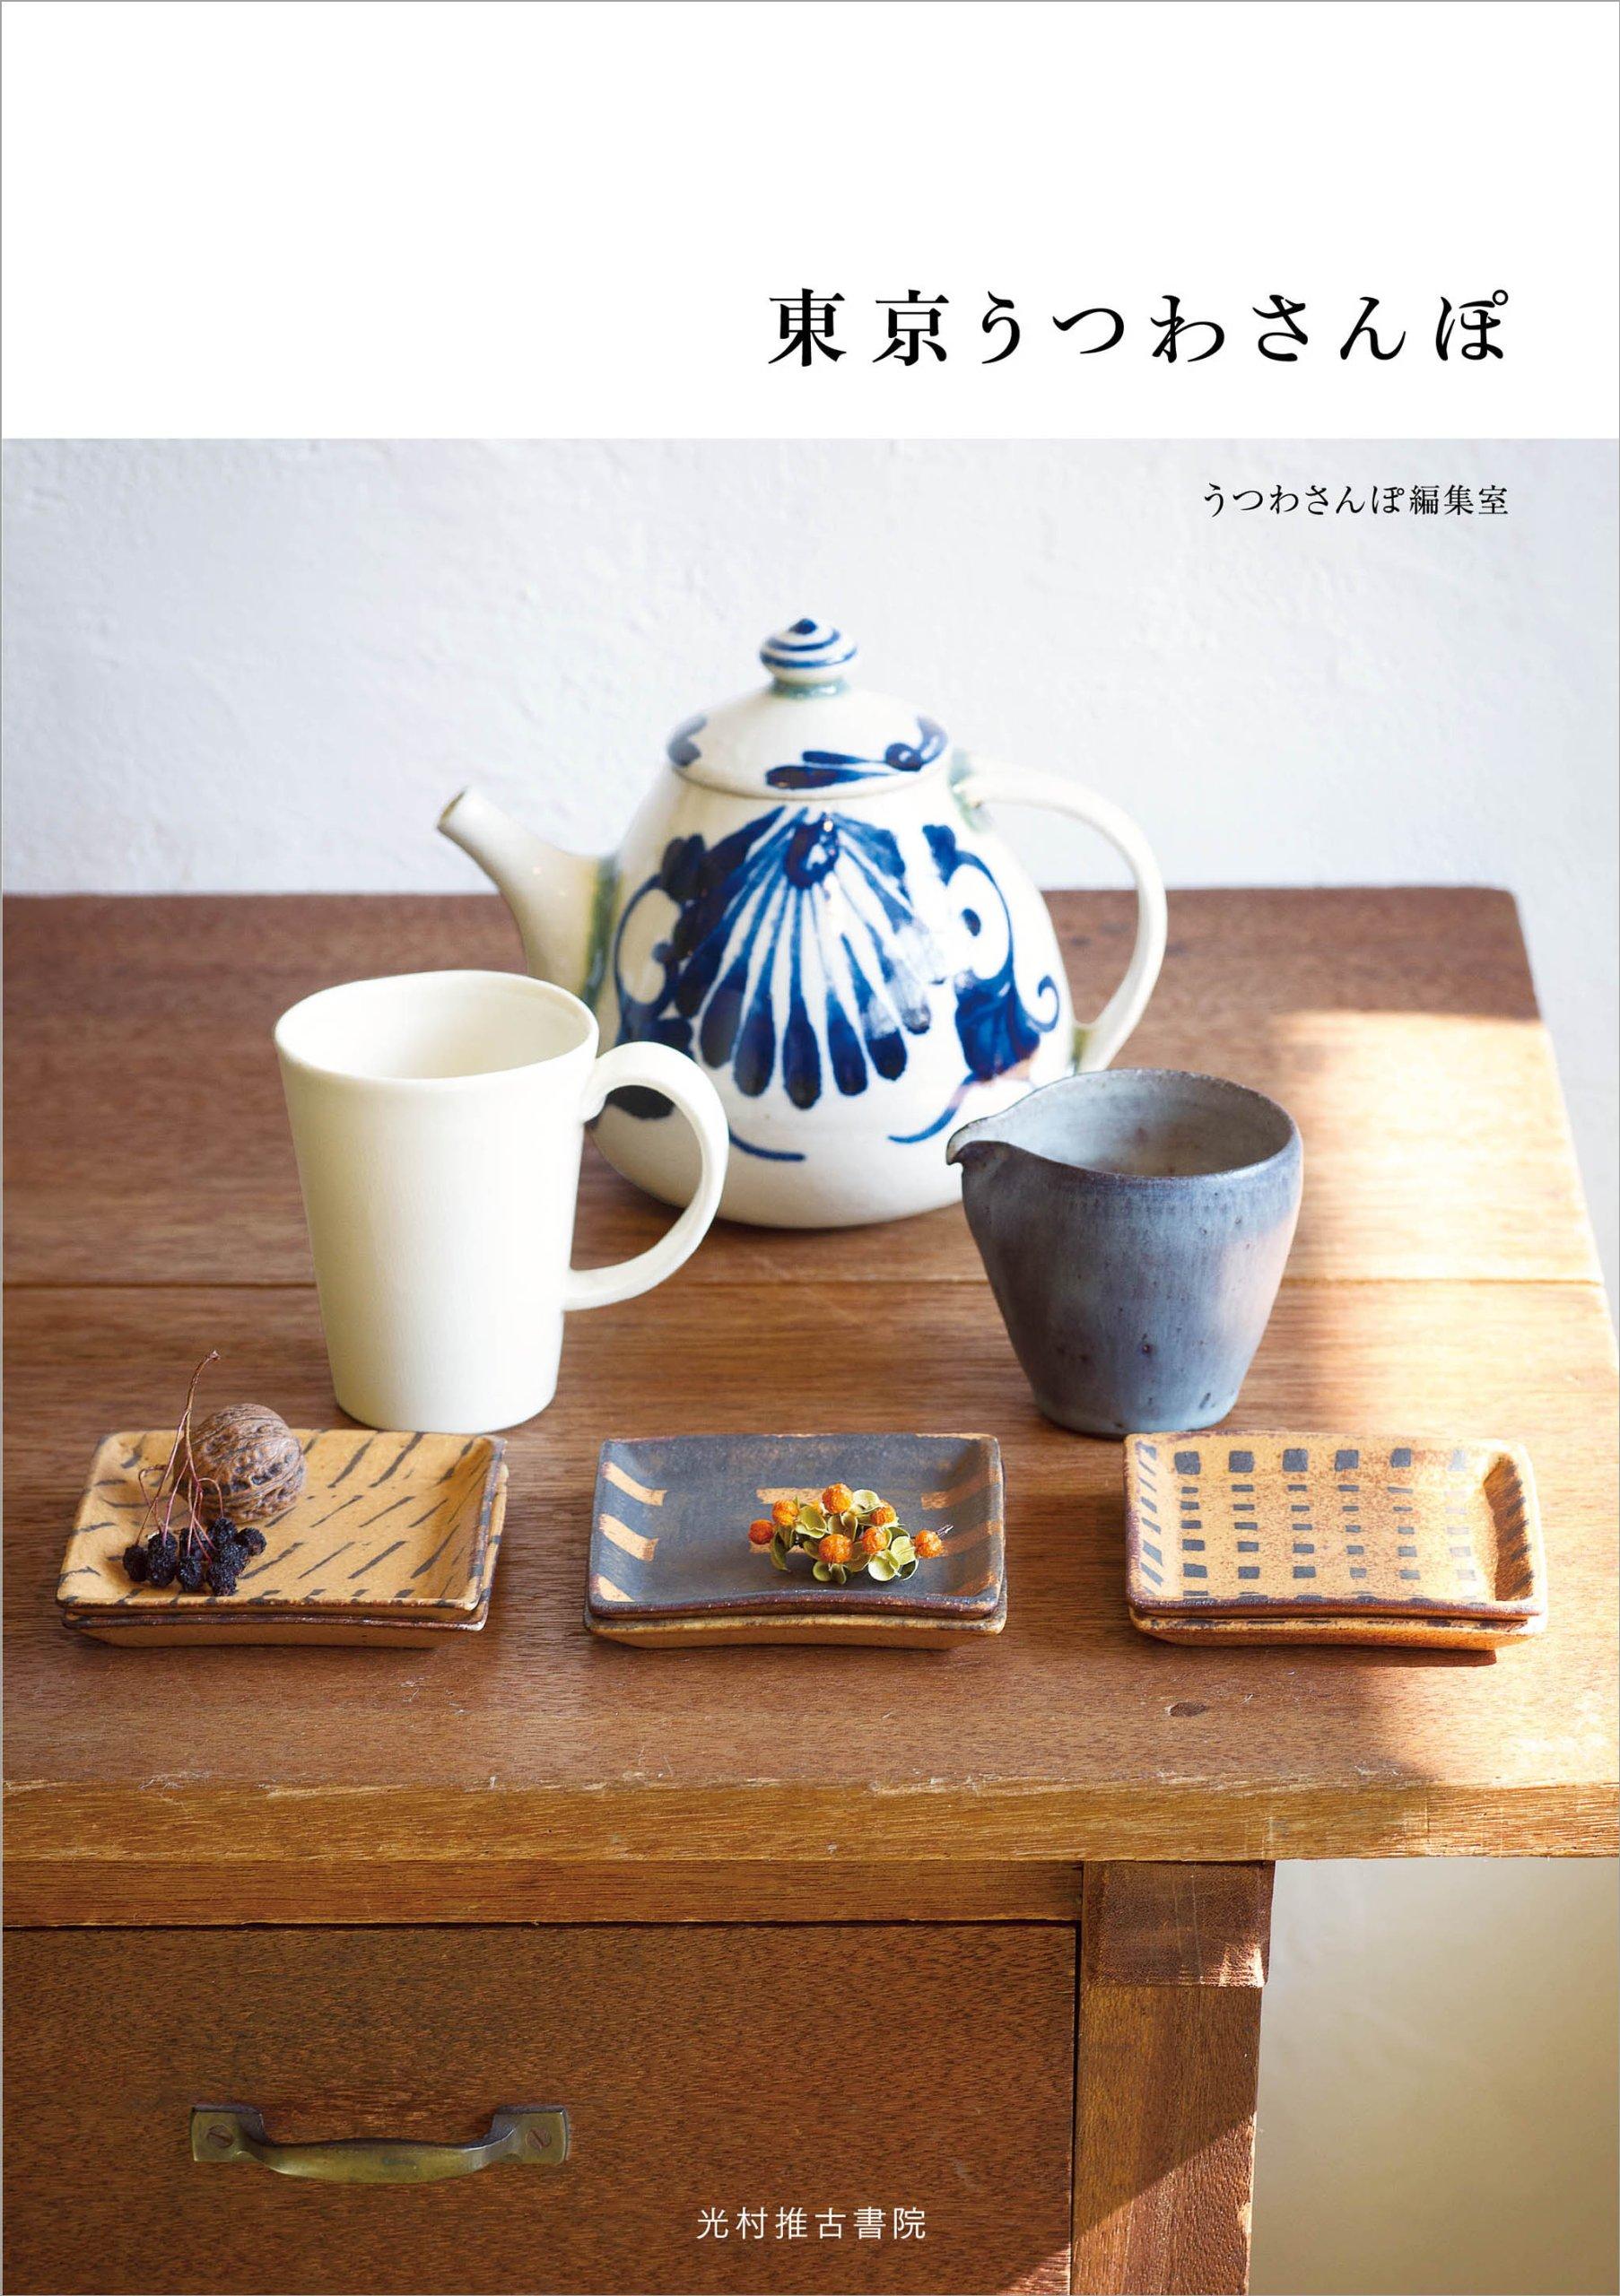 Tōkyō utsuwasanpo pdf